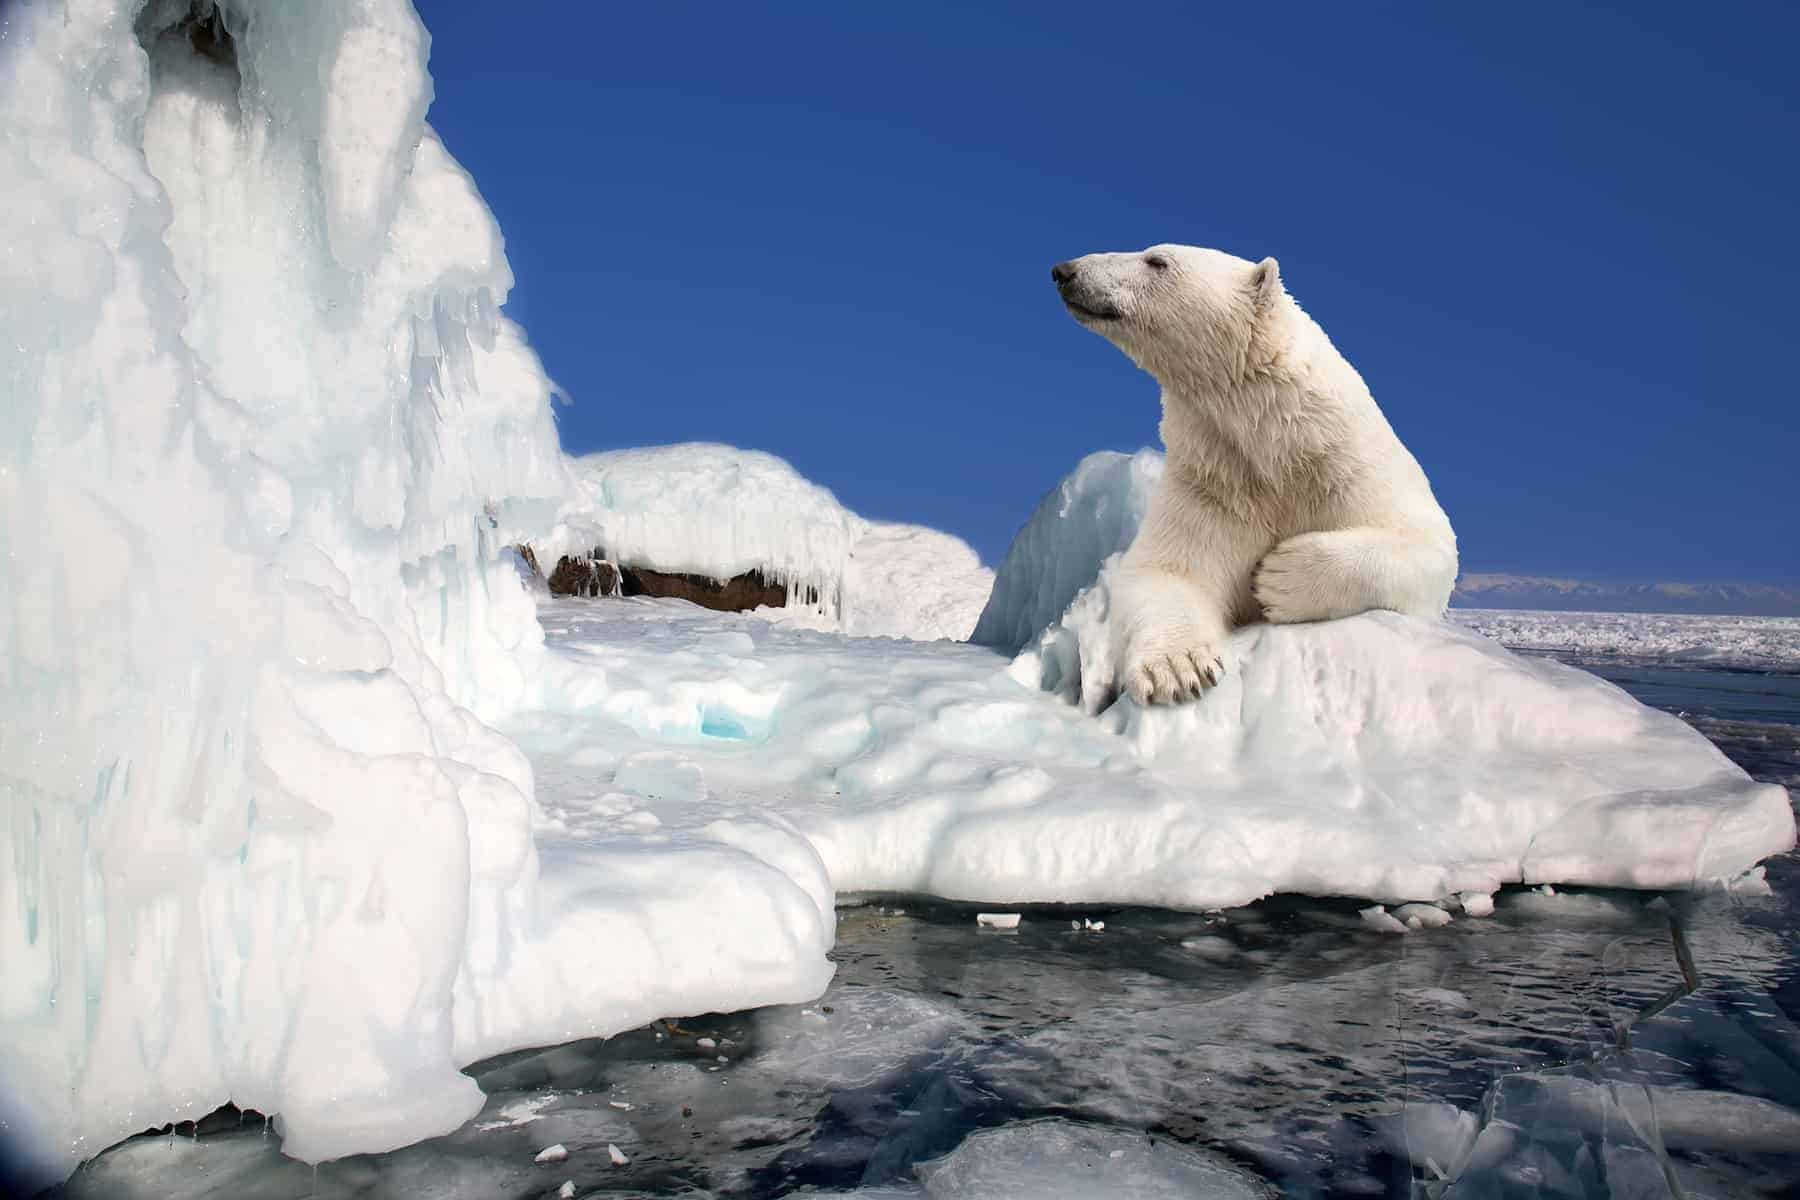 Polar bear standing on an ice block, Svalbard, Norway